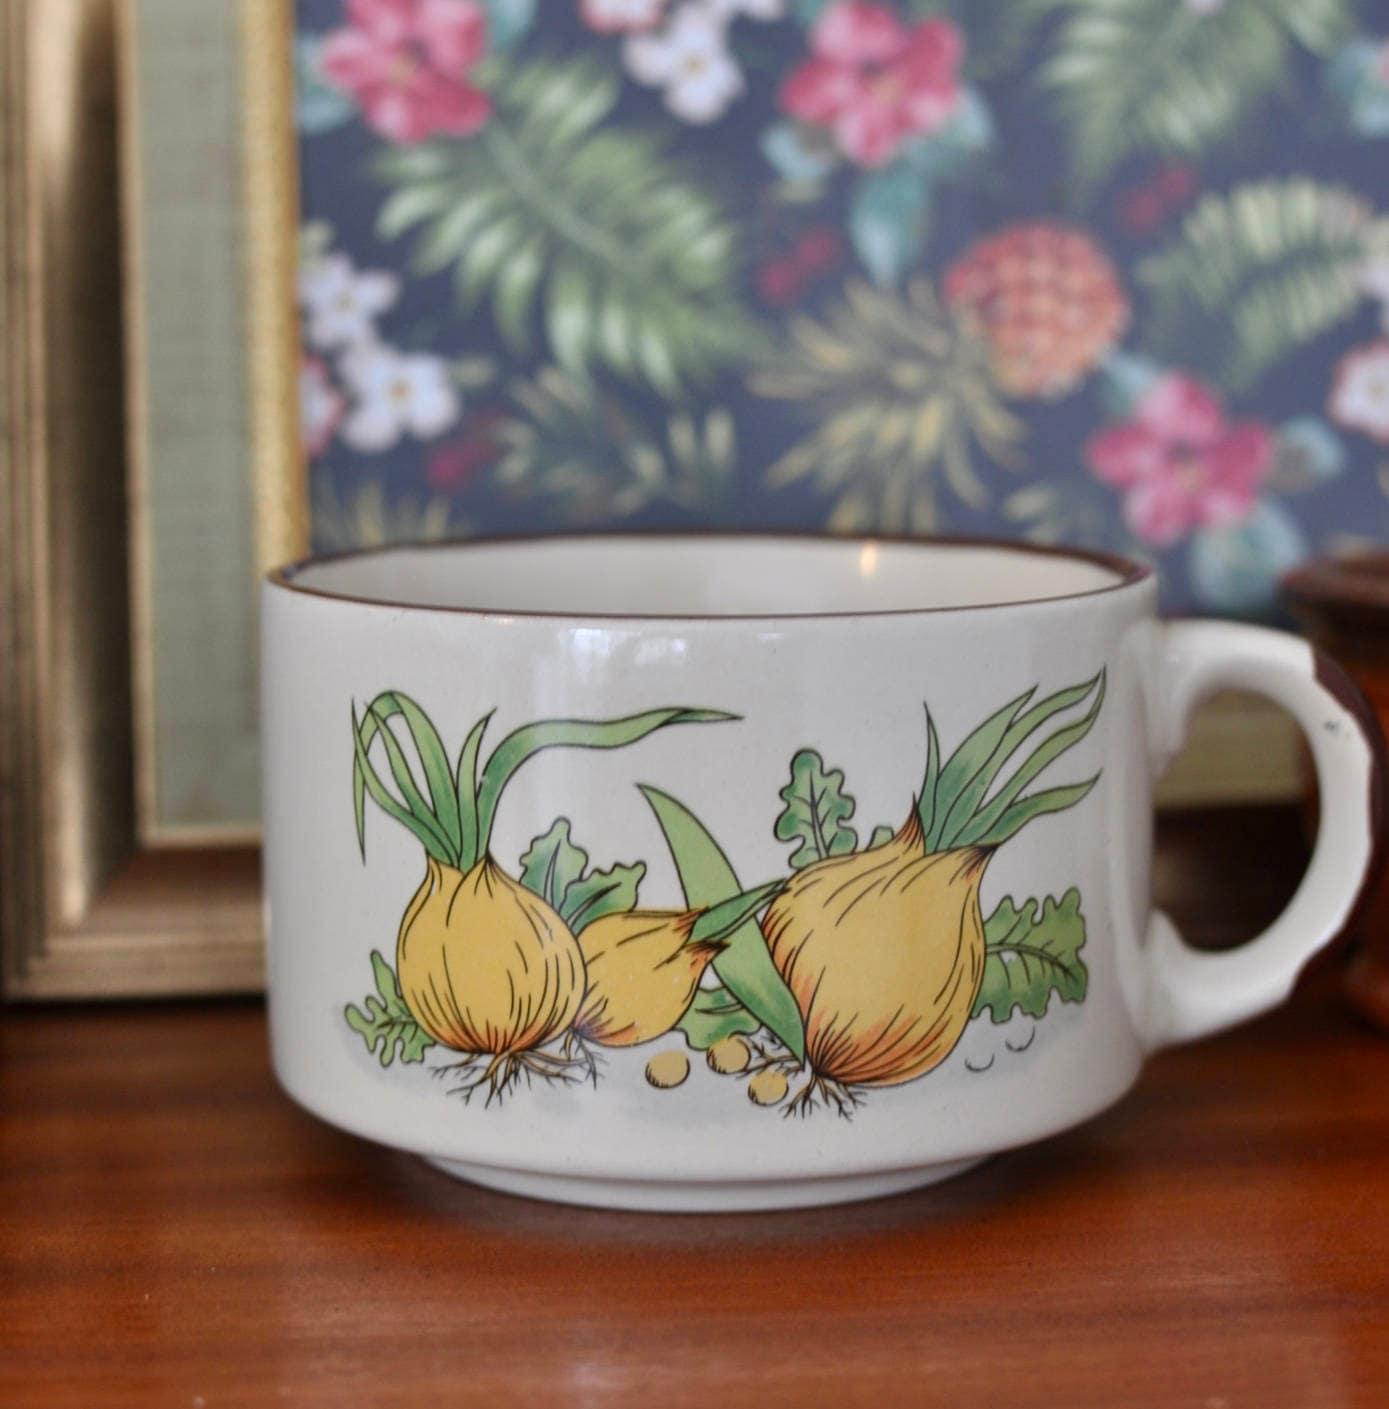 Vintage Porcelain French Onion Soup Bowl, Soup Mug, One Handle Bowl ...